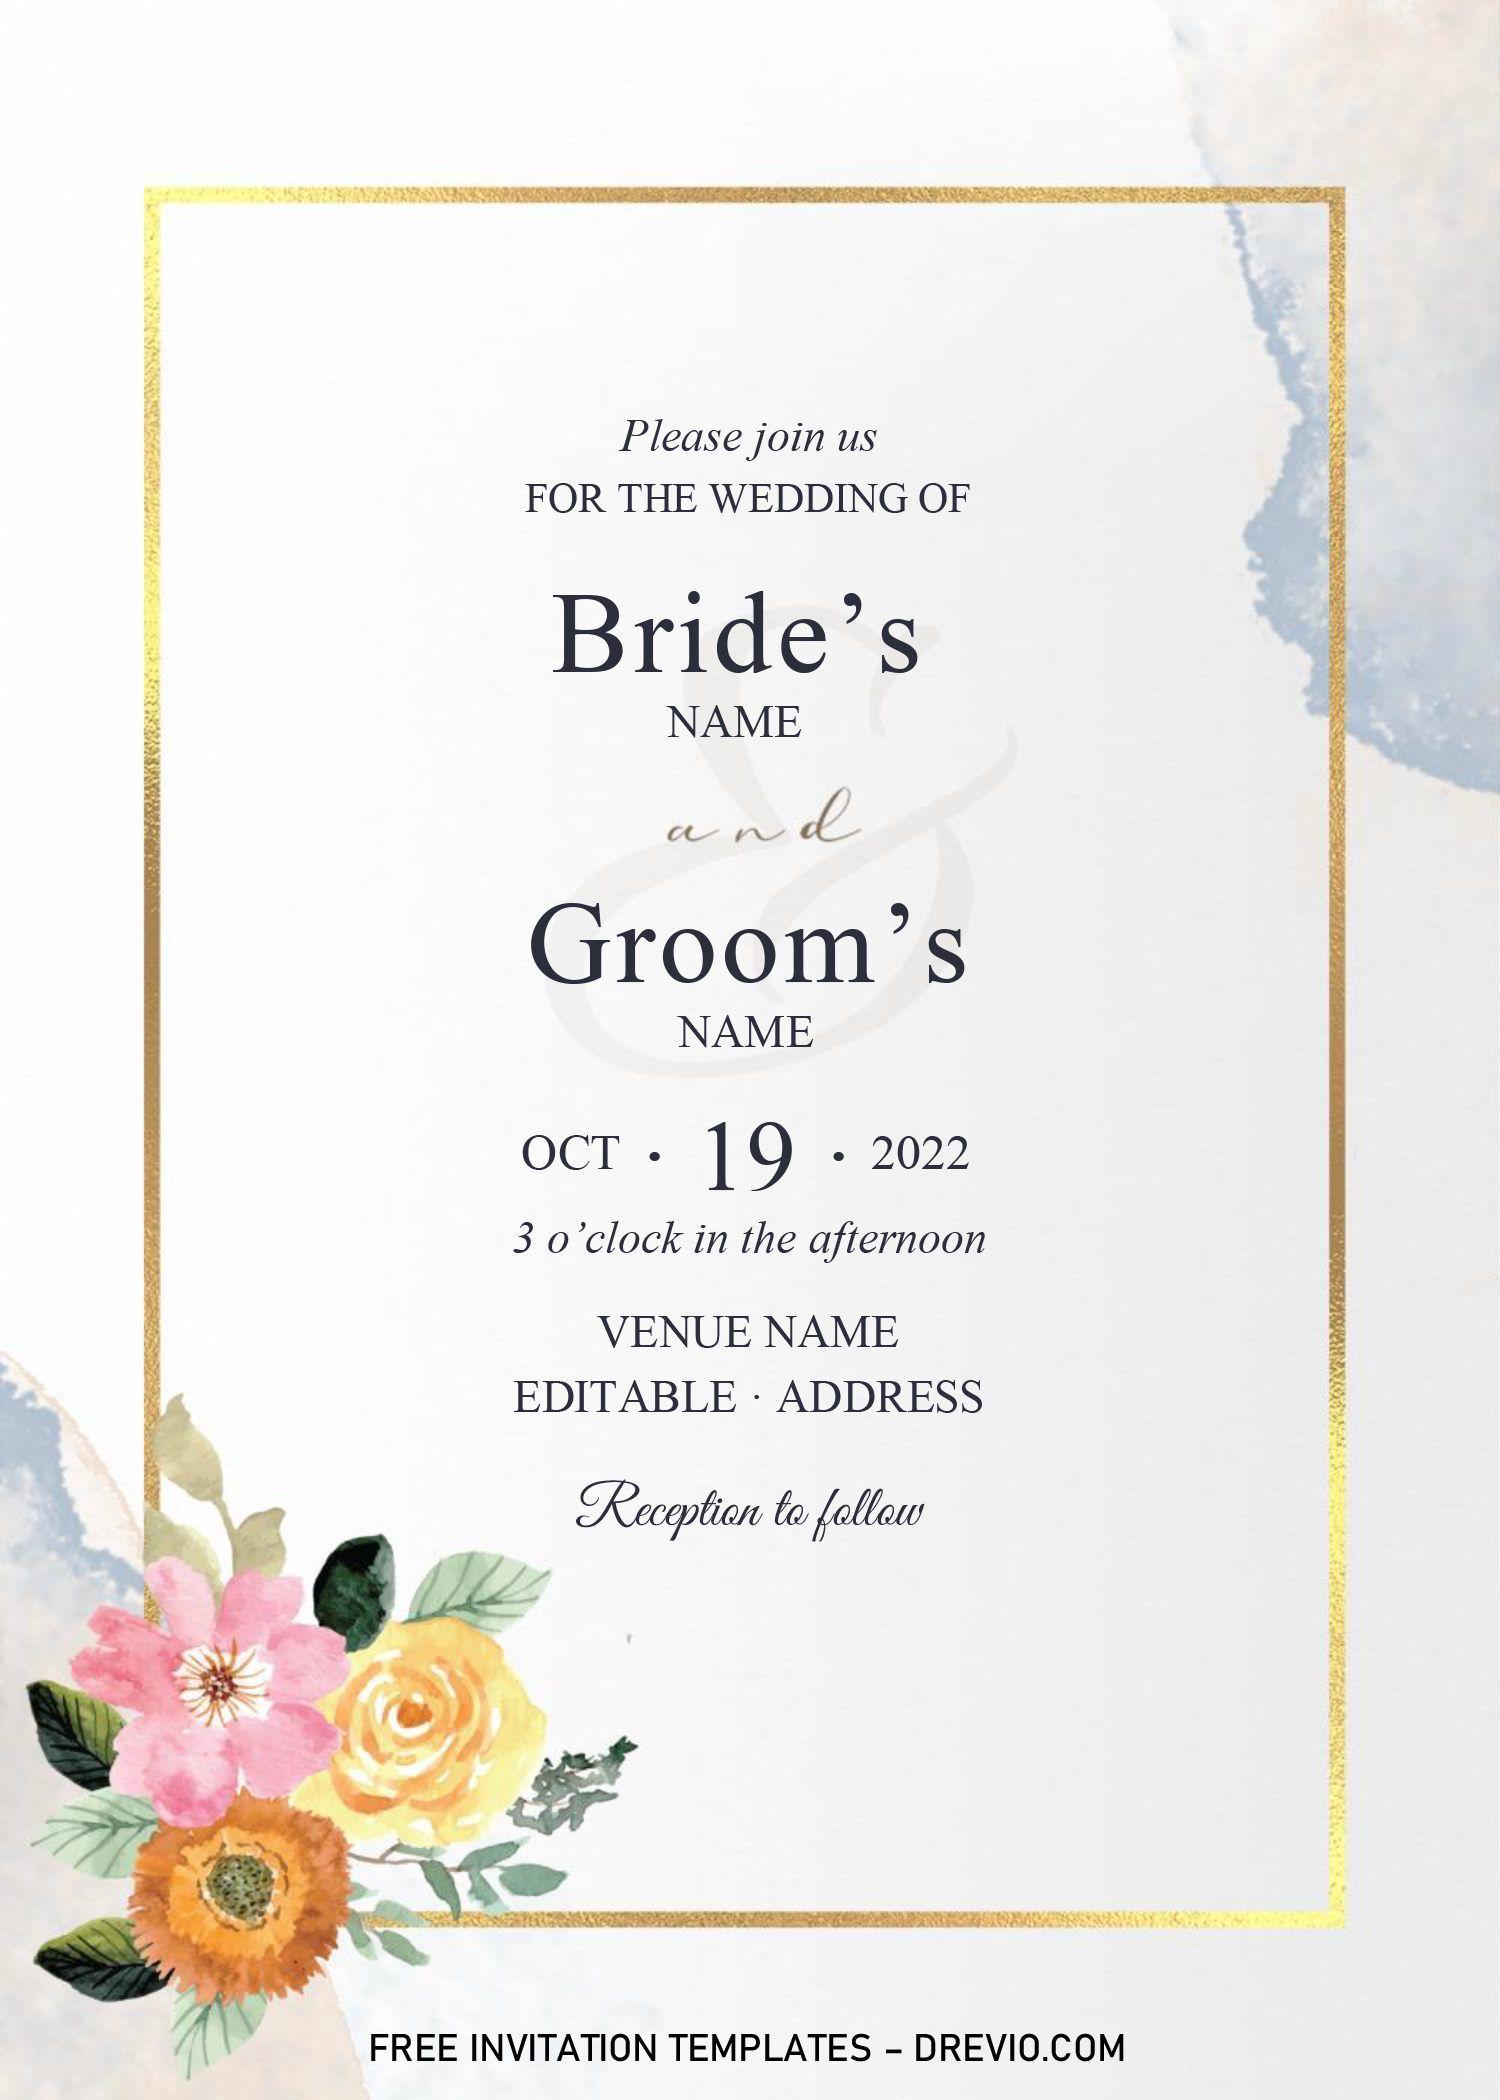 Golden Frame Wedding Invitation Templates Editable With Microsoft Word Wedding Invitation Templates Invitation Template Free Printable Birthday Invitations